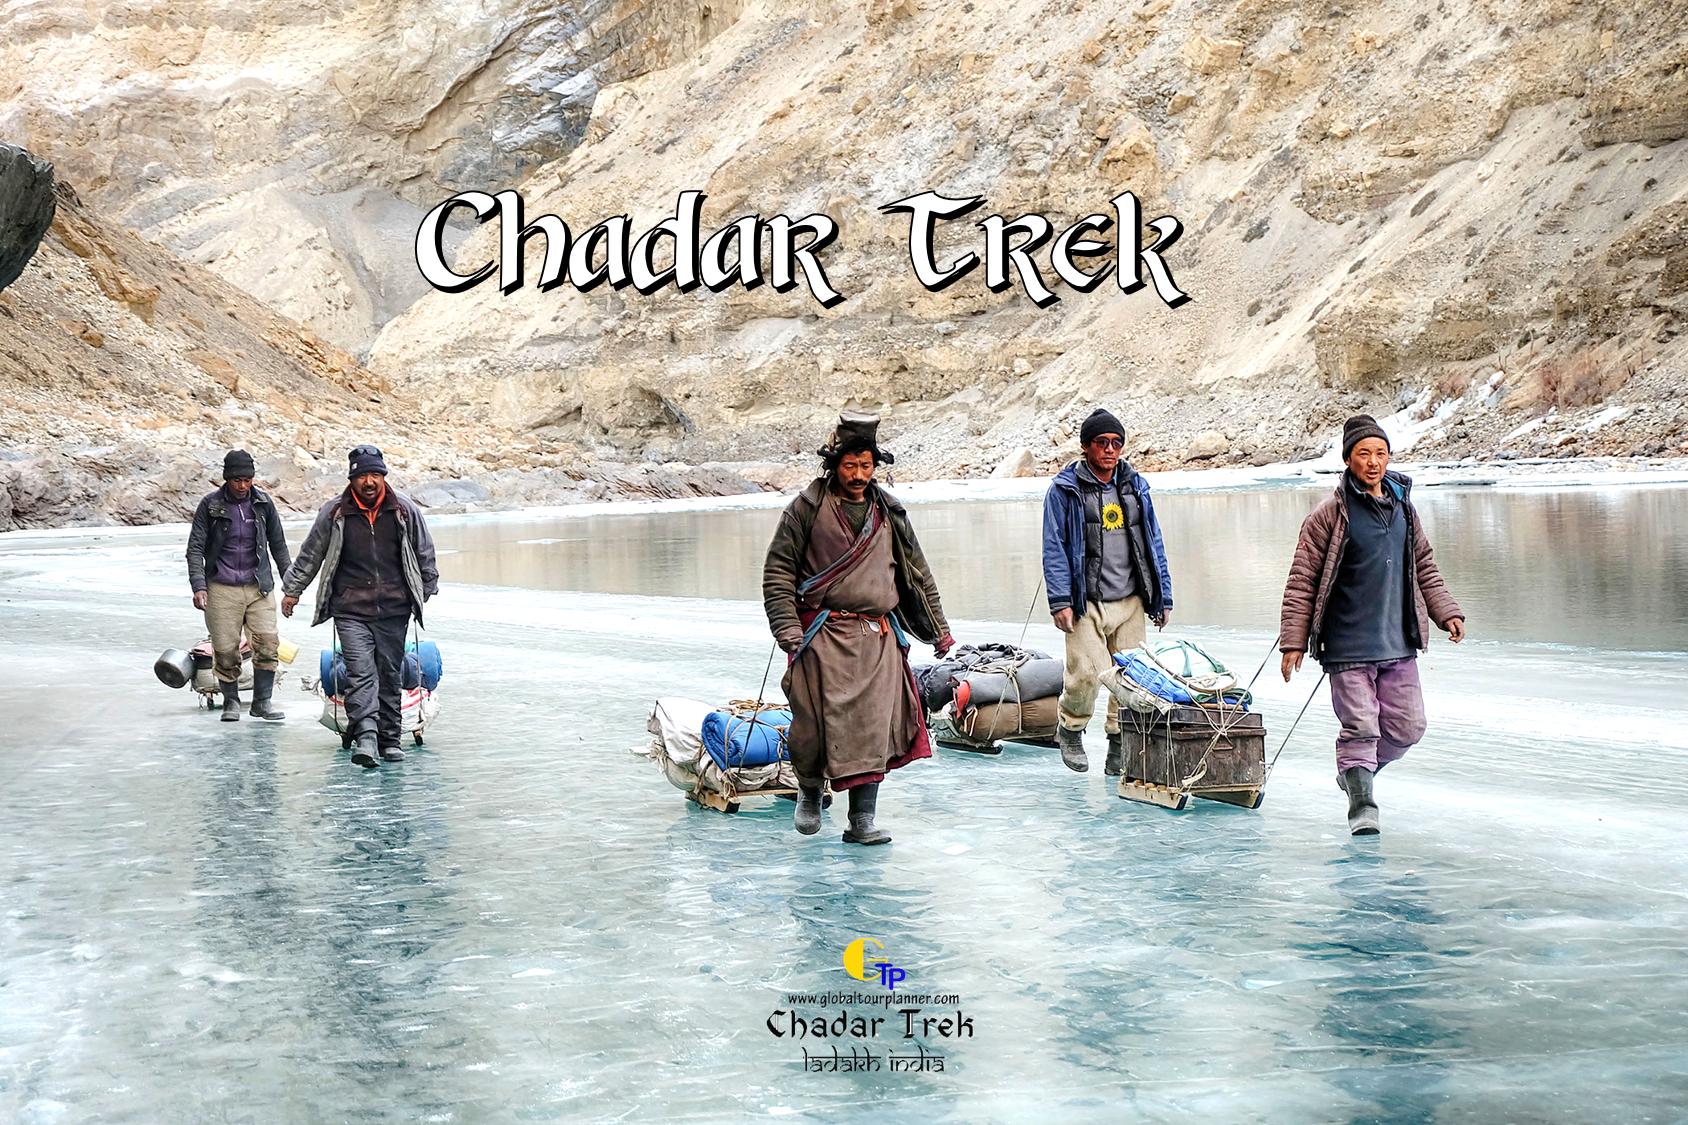 Chadar Trek Locals walking on Zanskar Frozen River